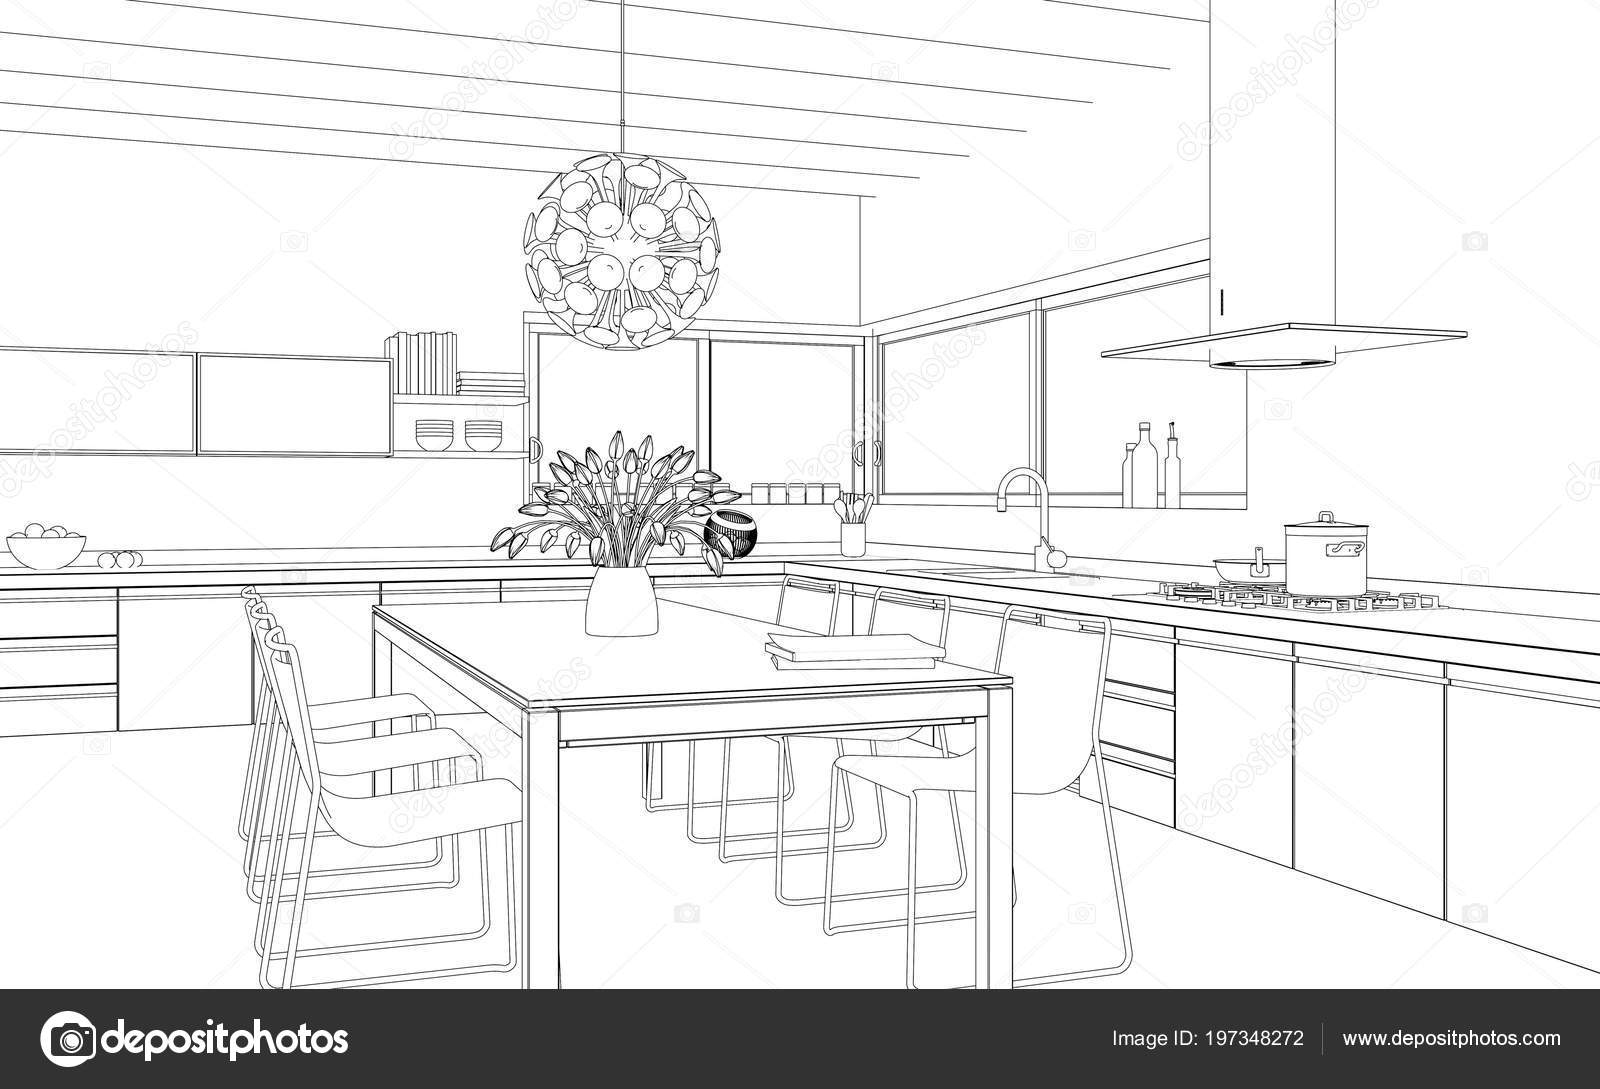 Interior Design modern Kitchen Drawing Plan Stock Photo by ...